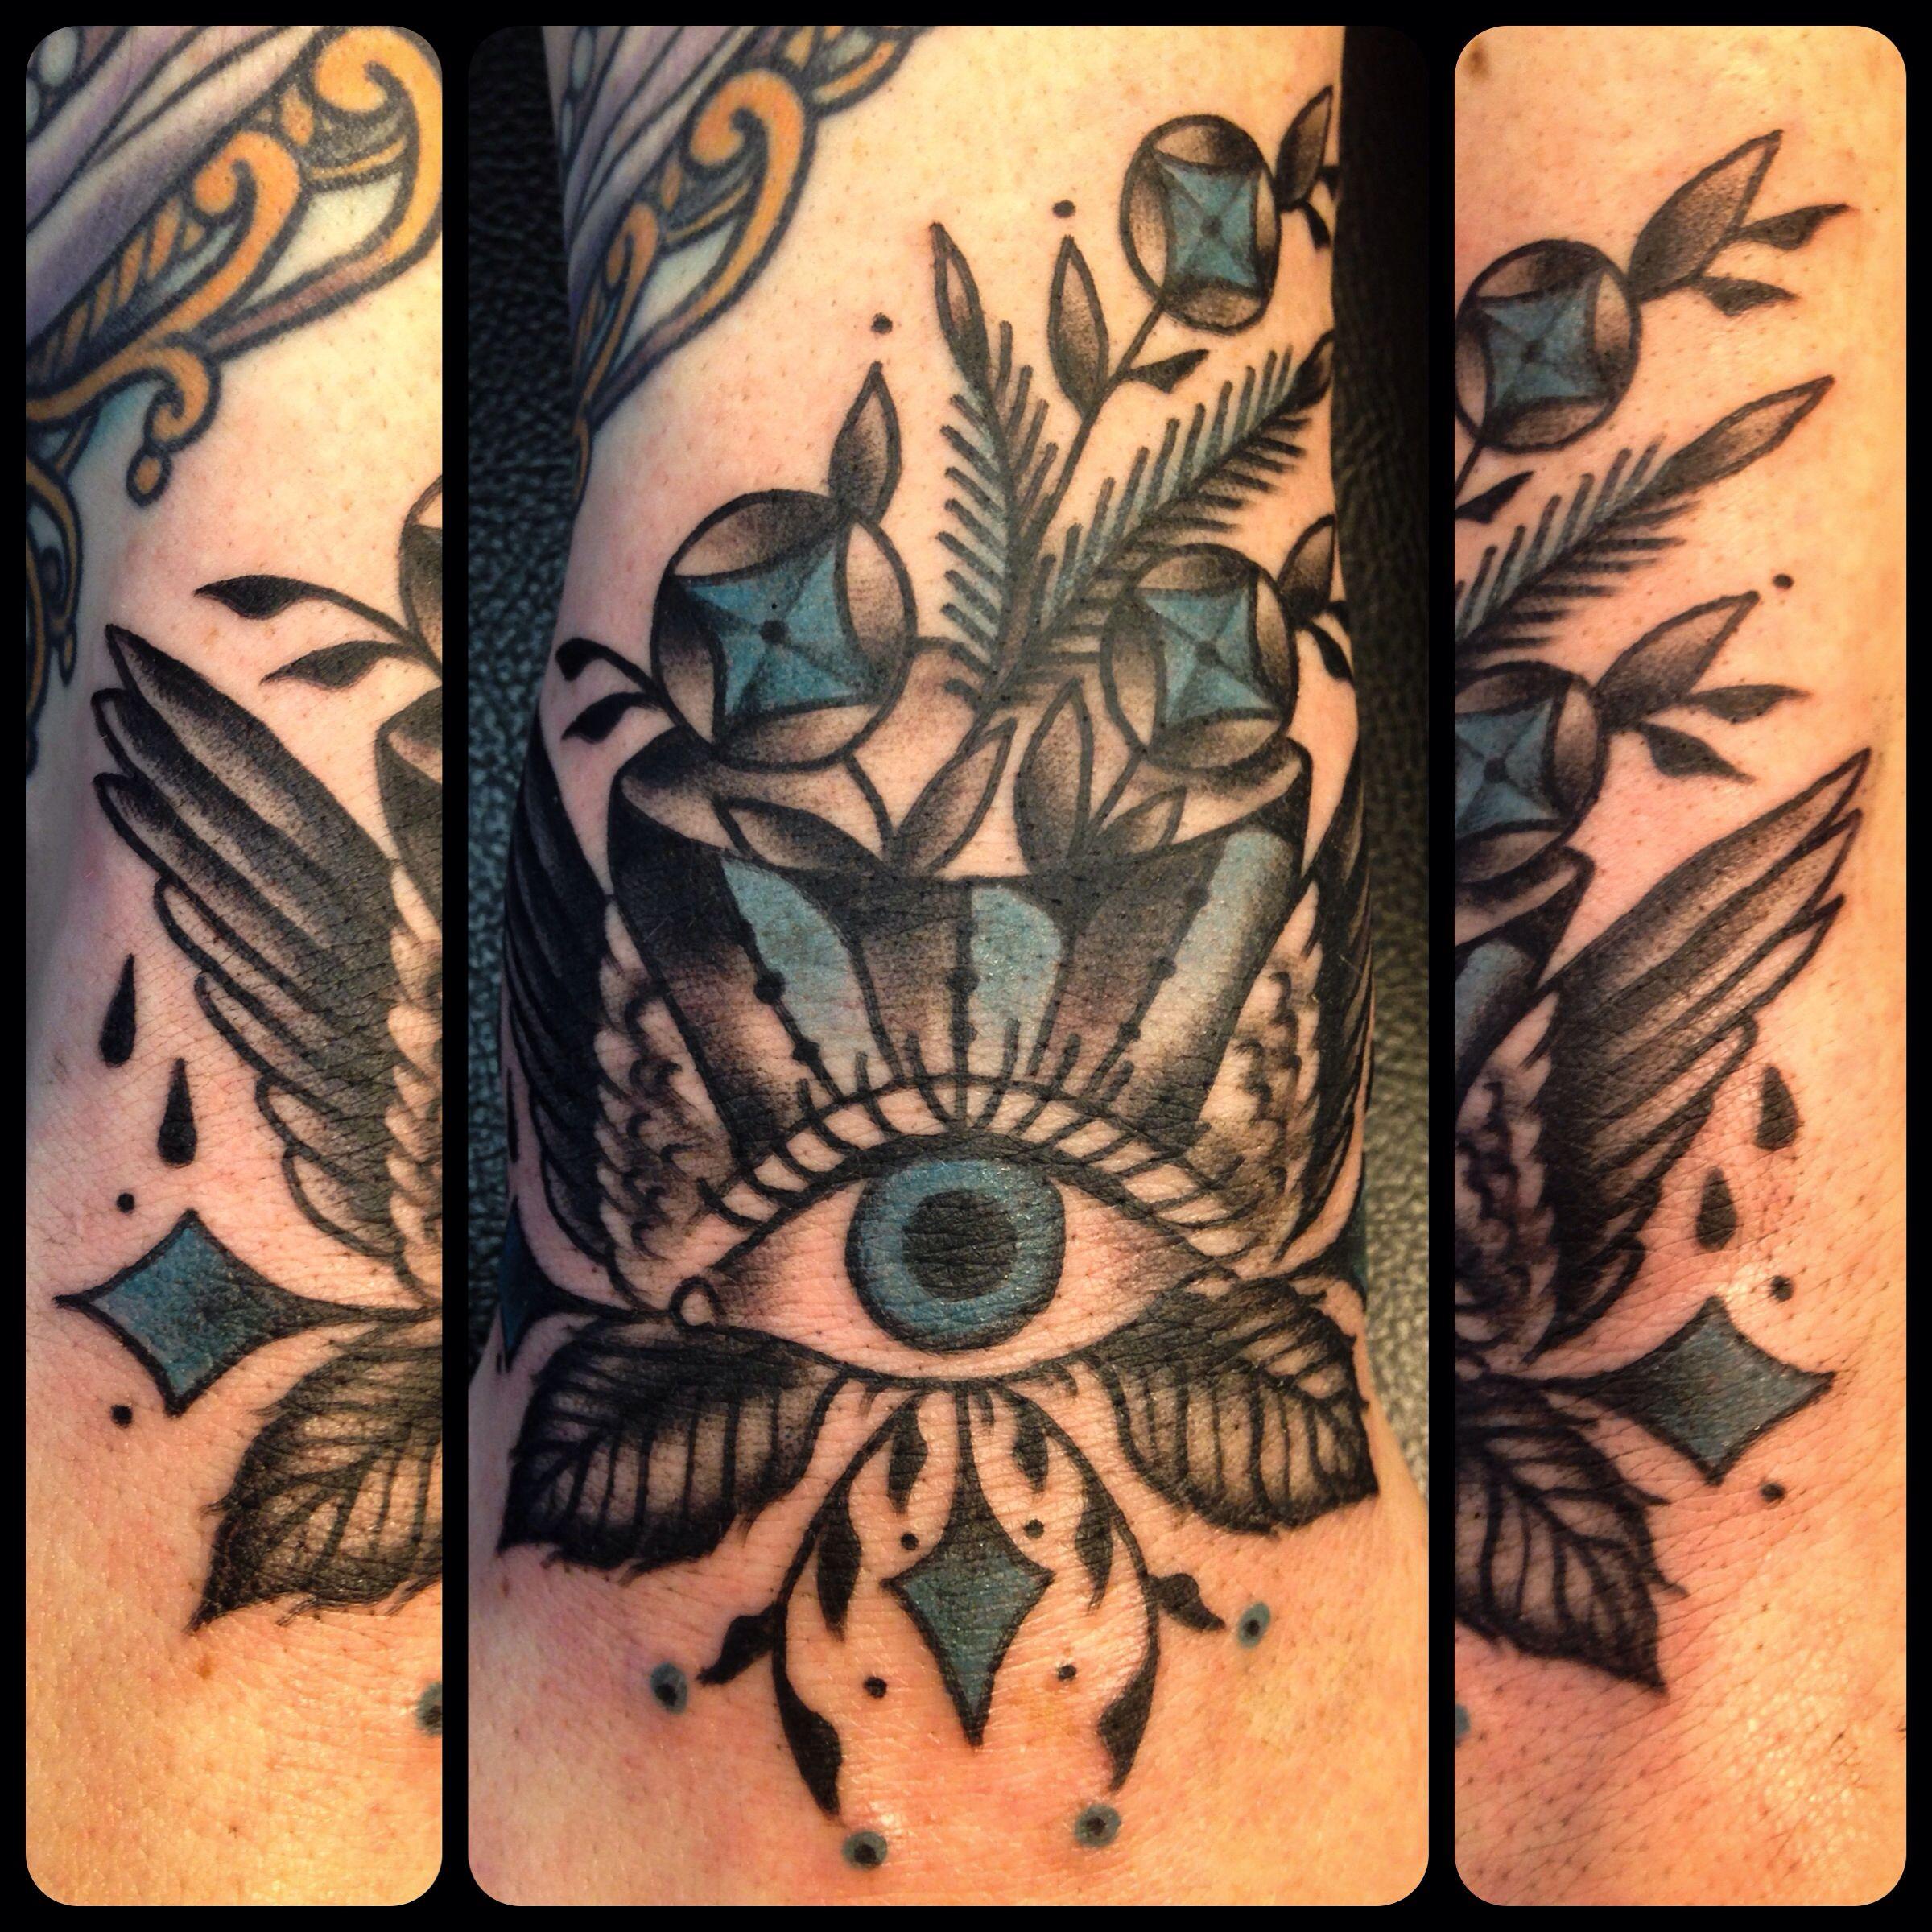 Thank You Littlebodybigheart Done At Goodlucktattoo: Laura Graham - Lady Luck Tattoo - Portland, OR